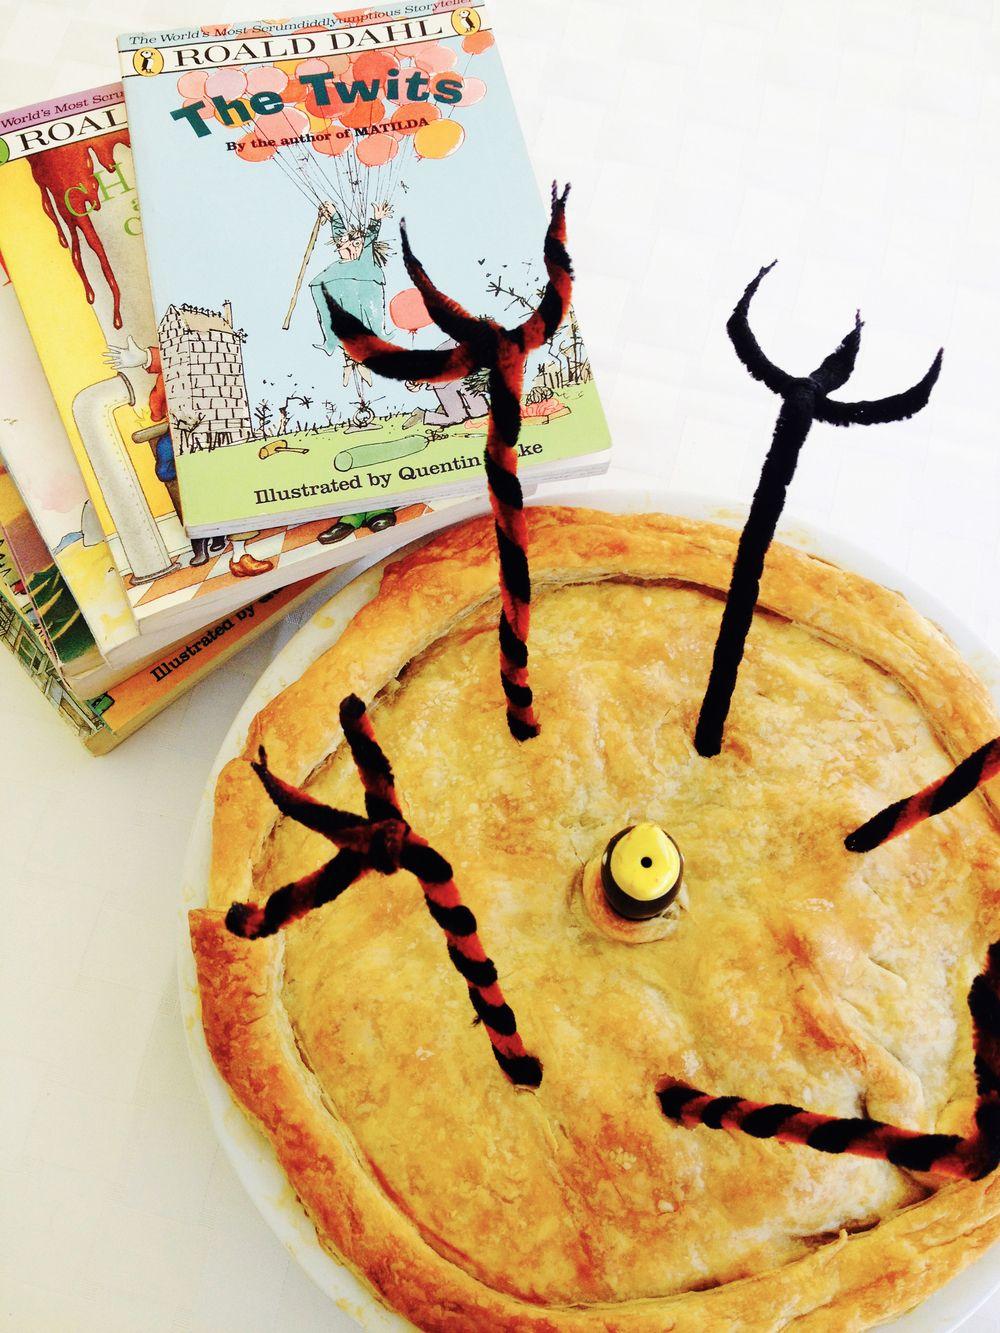 Workbooks the twits worksheets ks2 : Roald Dahl's Revolting Recipes | Dahl, Literacy and Roald dahl ...